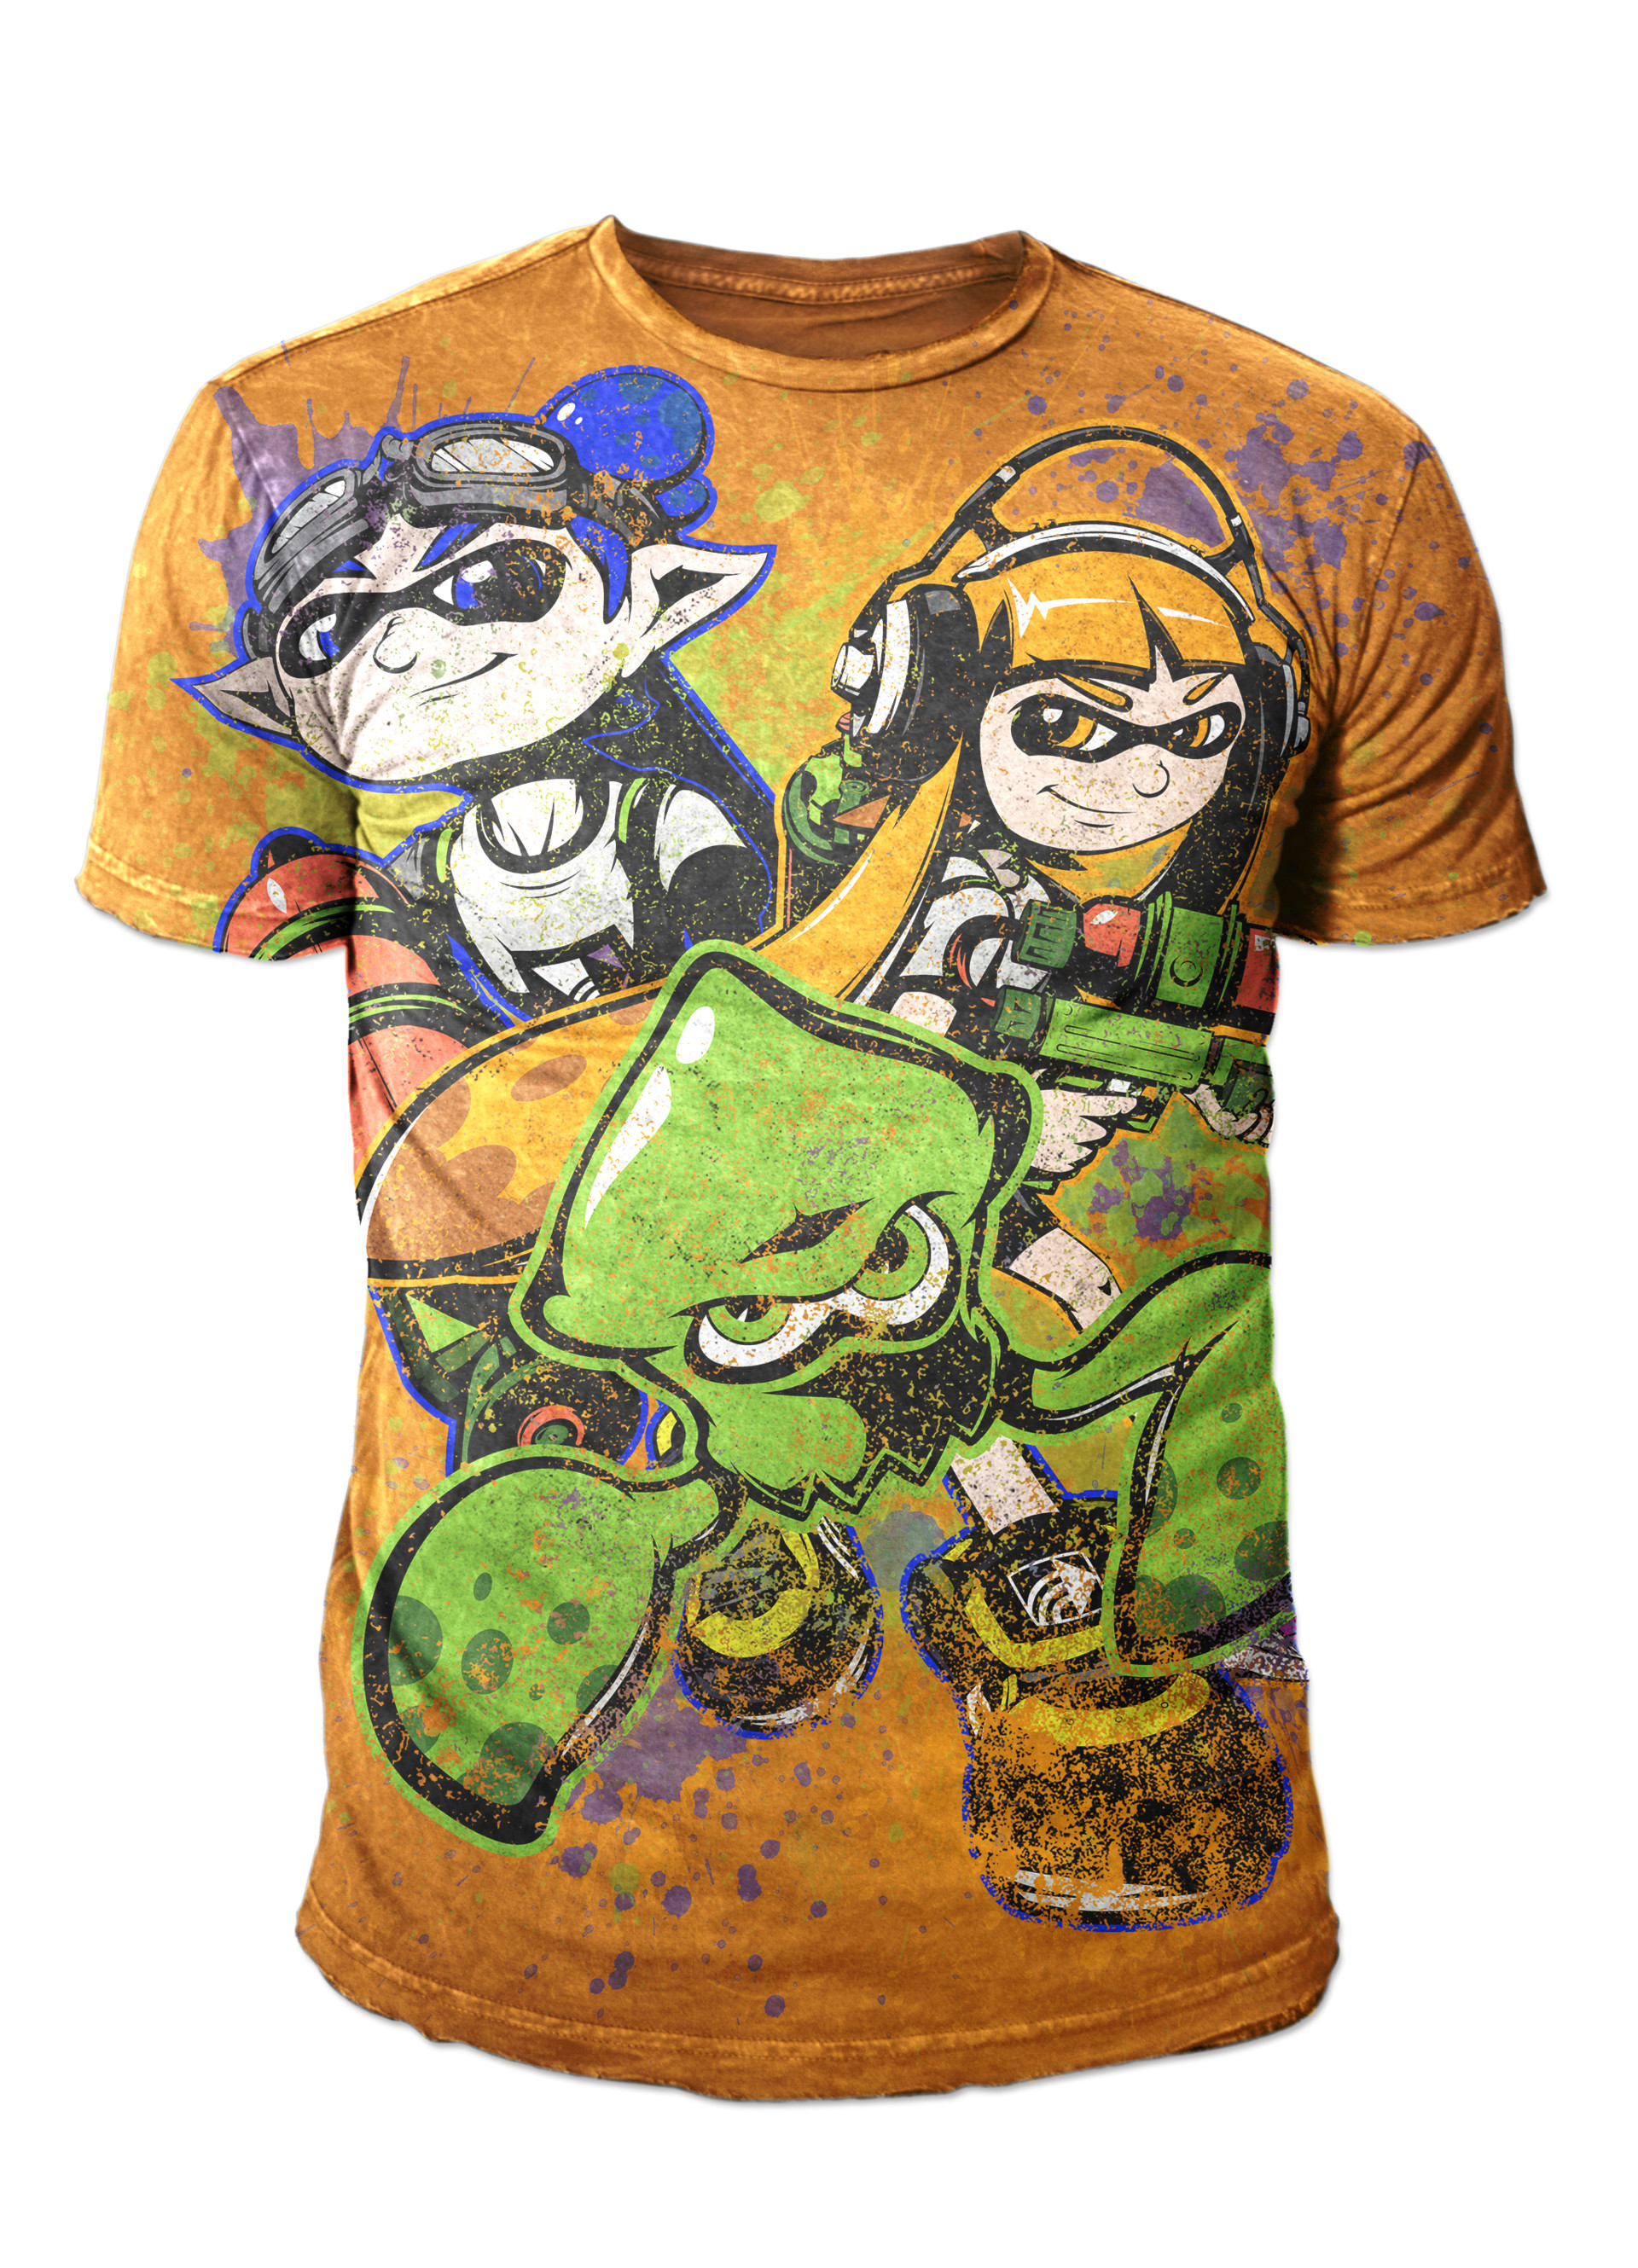 Nathaniel scramling splatoon shirt design